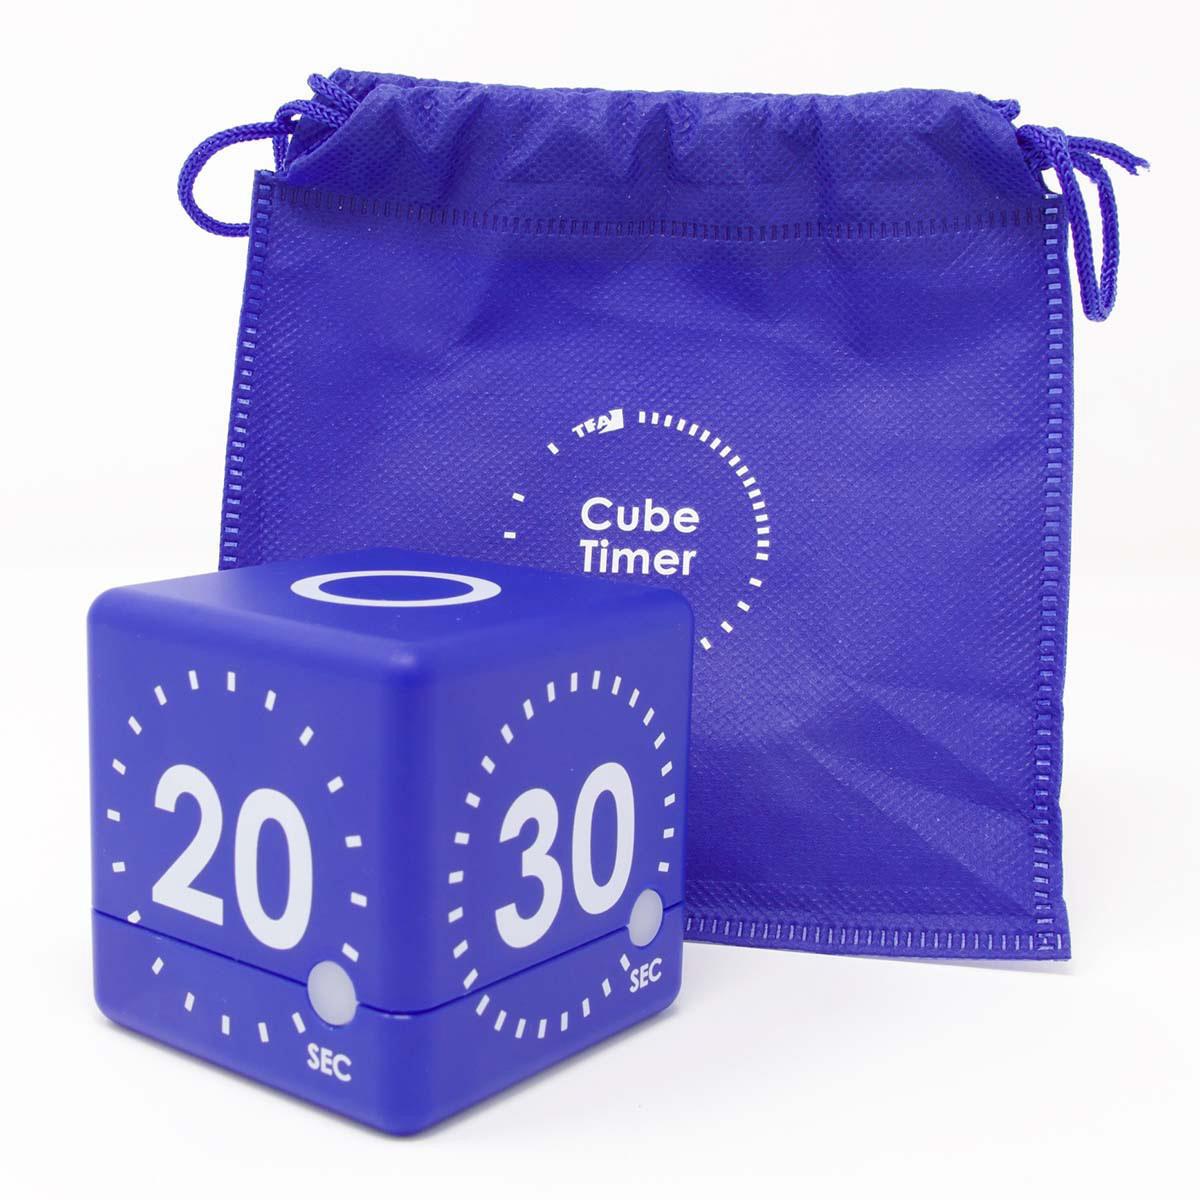 38-2036-06-digitaler-würfel-timer-cube-timer-zubehör-1200x1200px.jpg